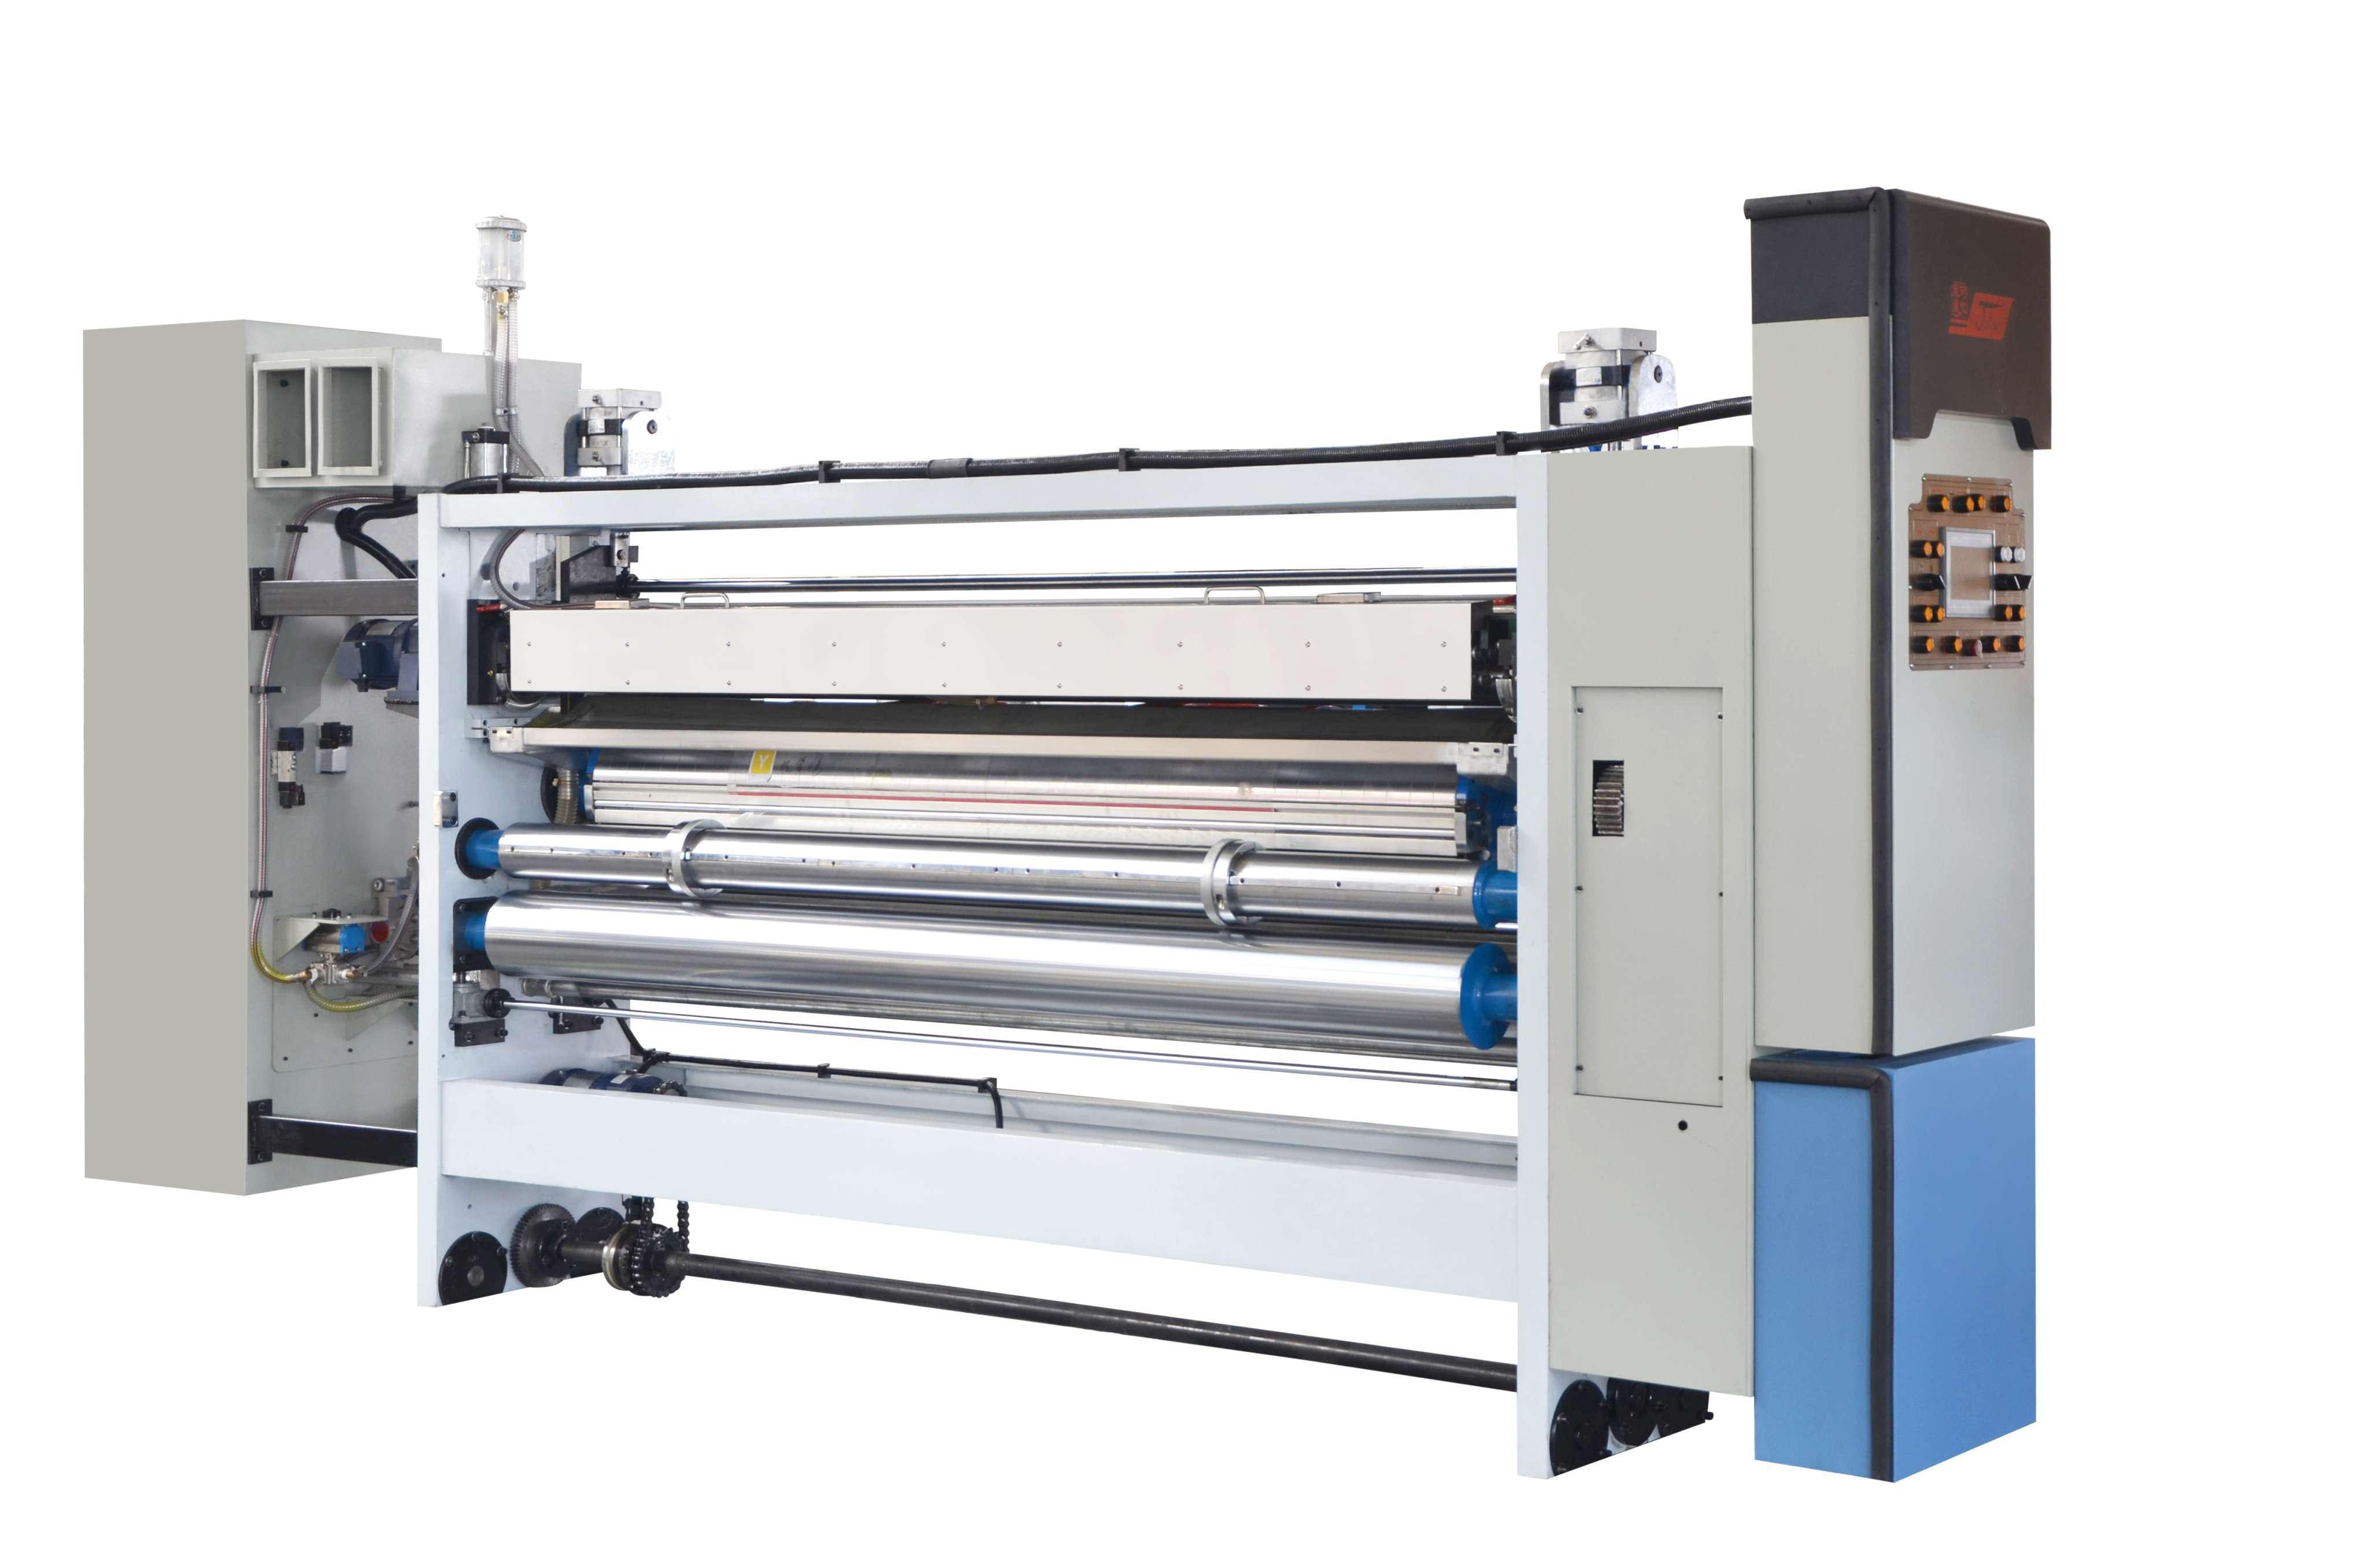 Rnn-1200 Automatic Printer Slotter Die Cutter